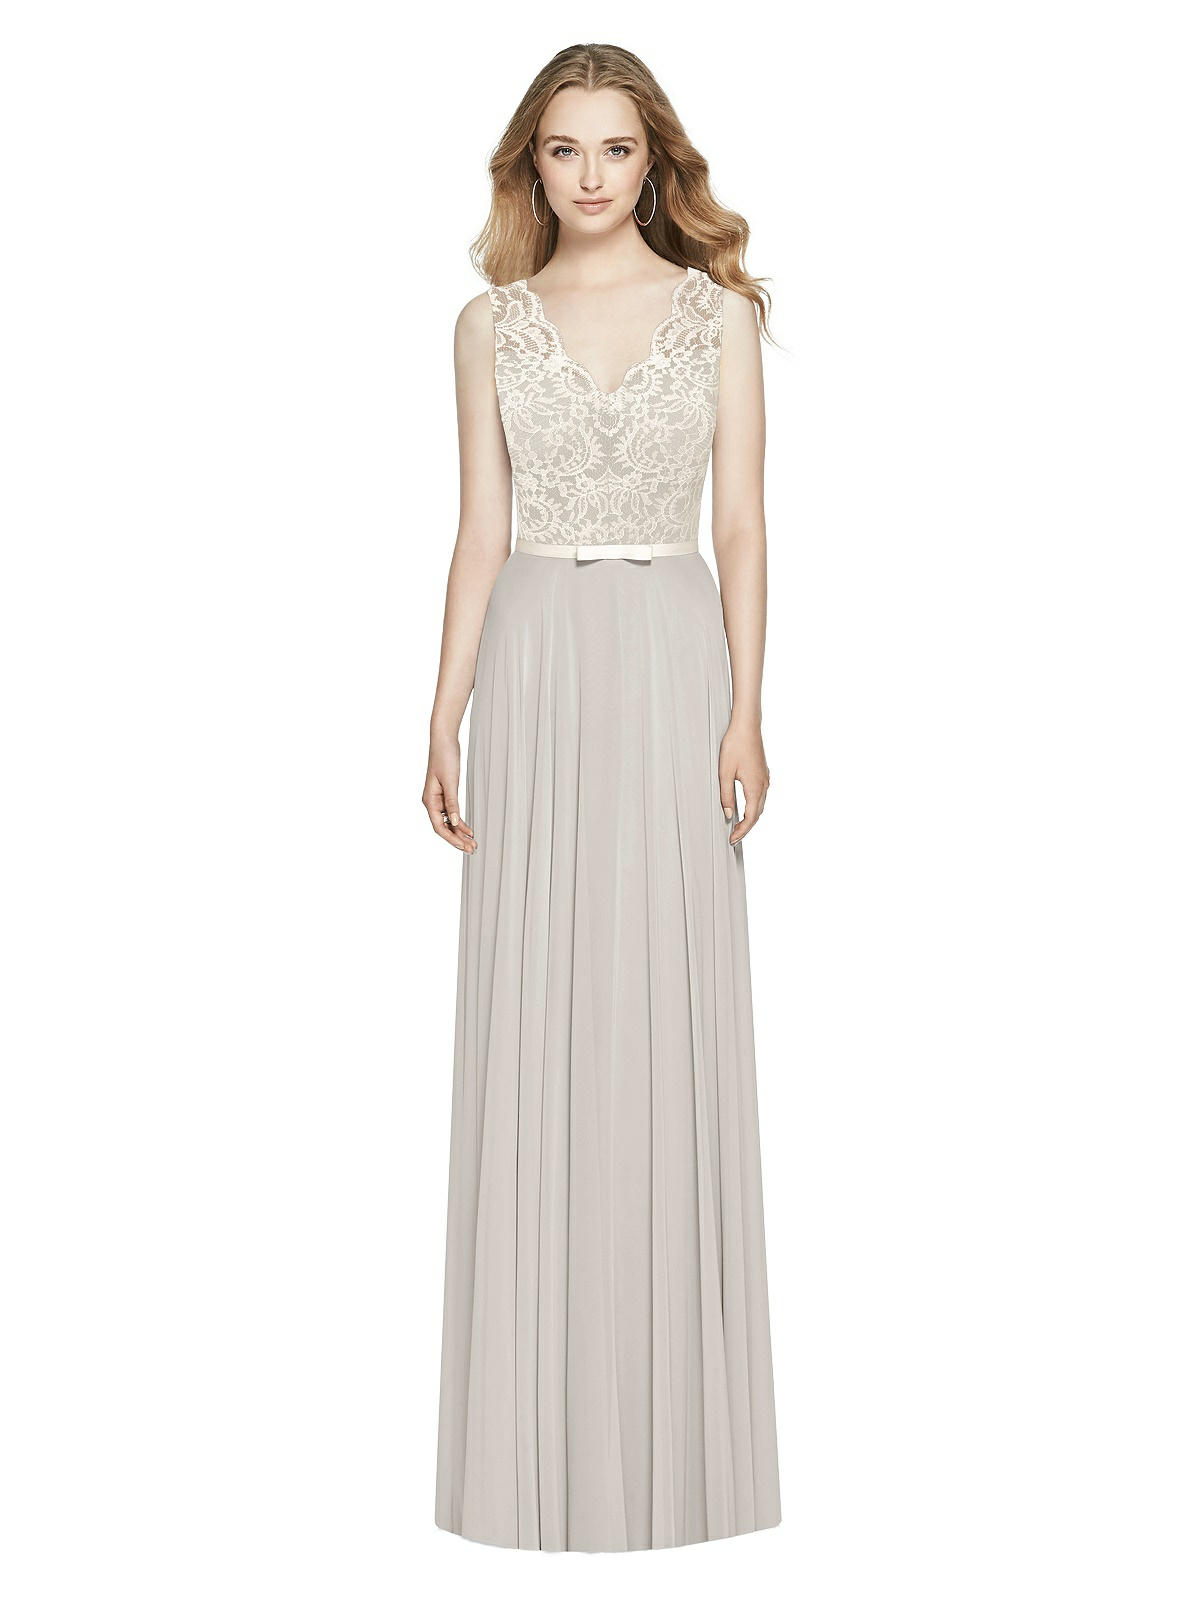 943b6c209df Dessy Ginger Bridesmaid Dresses - Gomes Weine AG